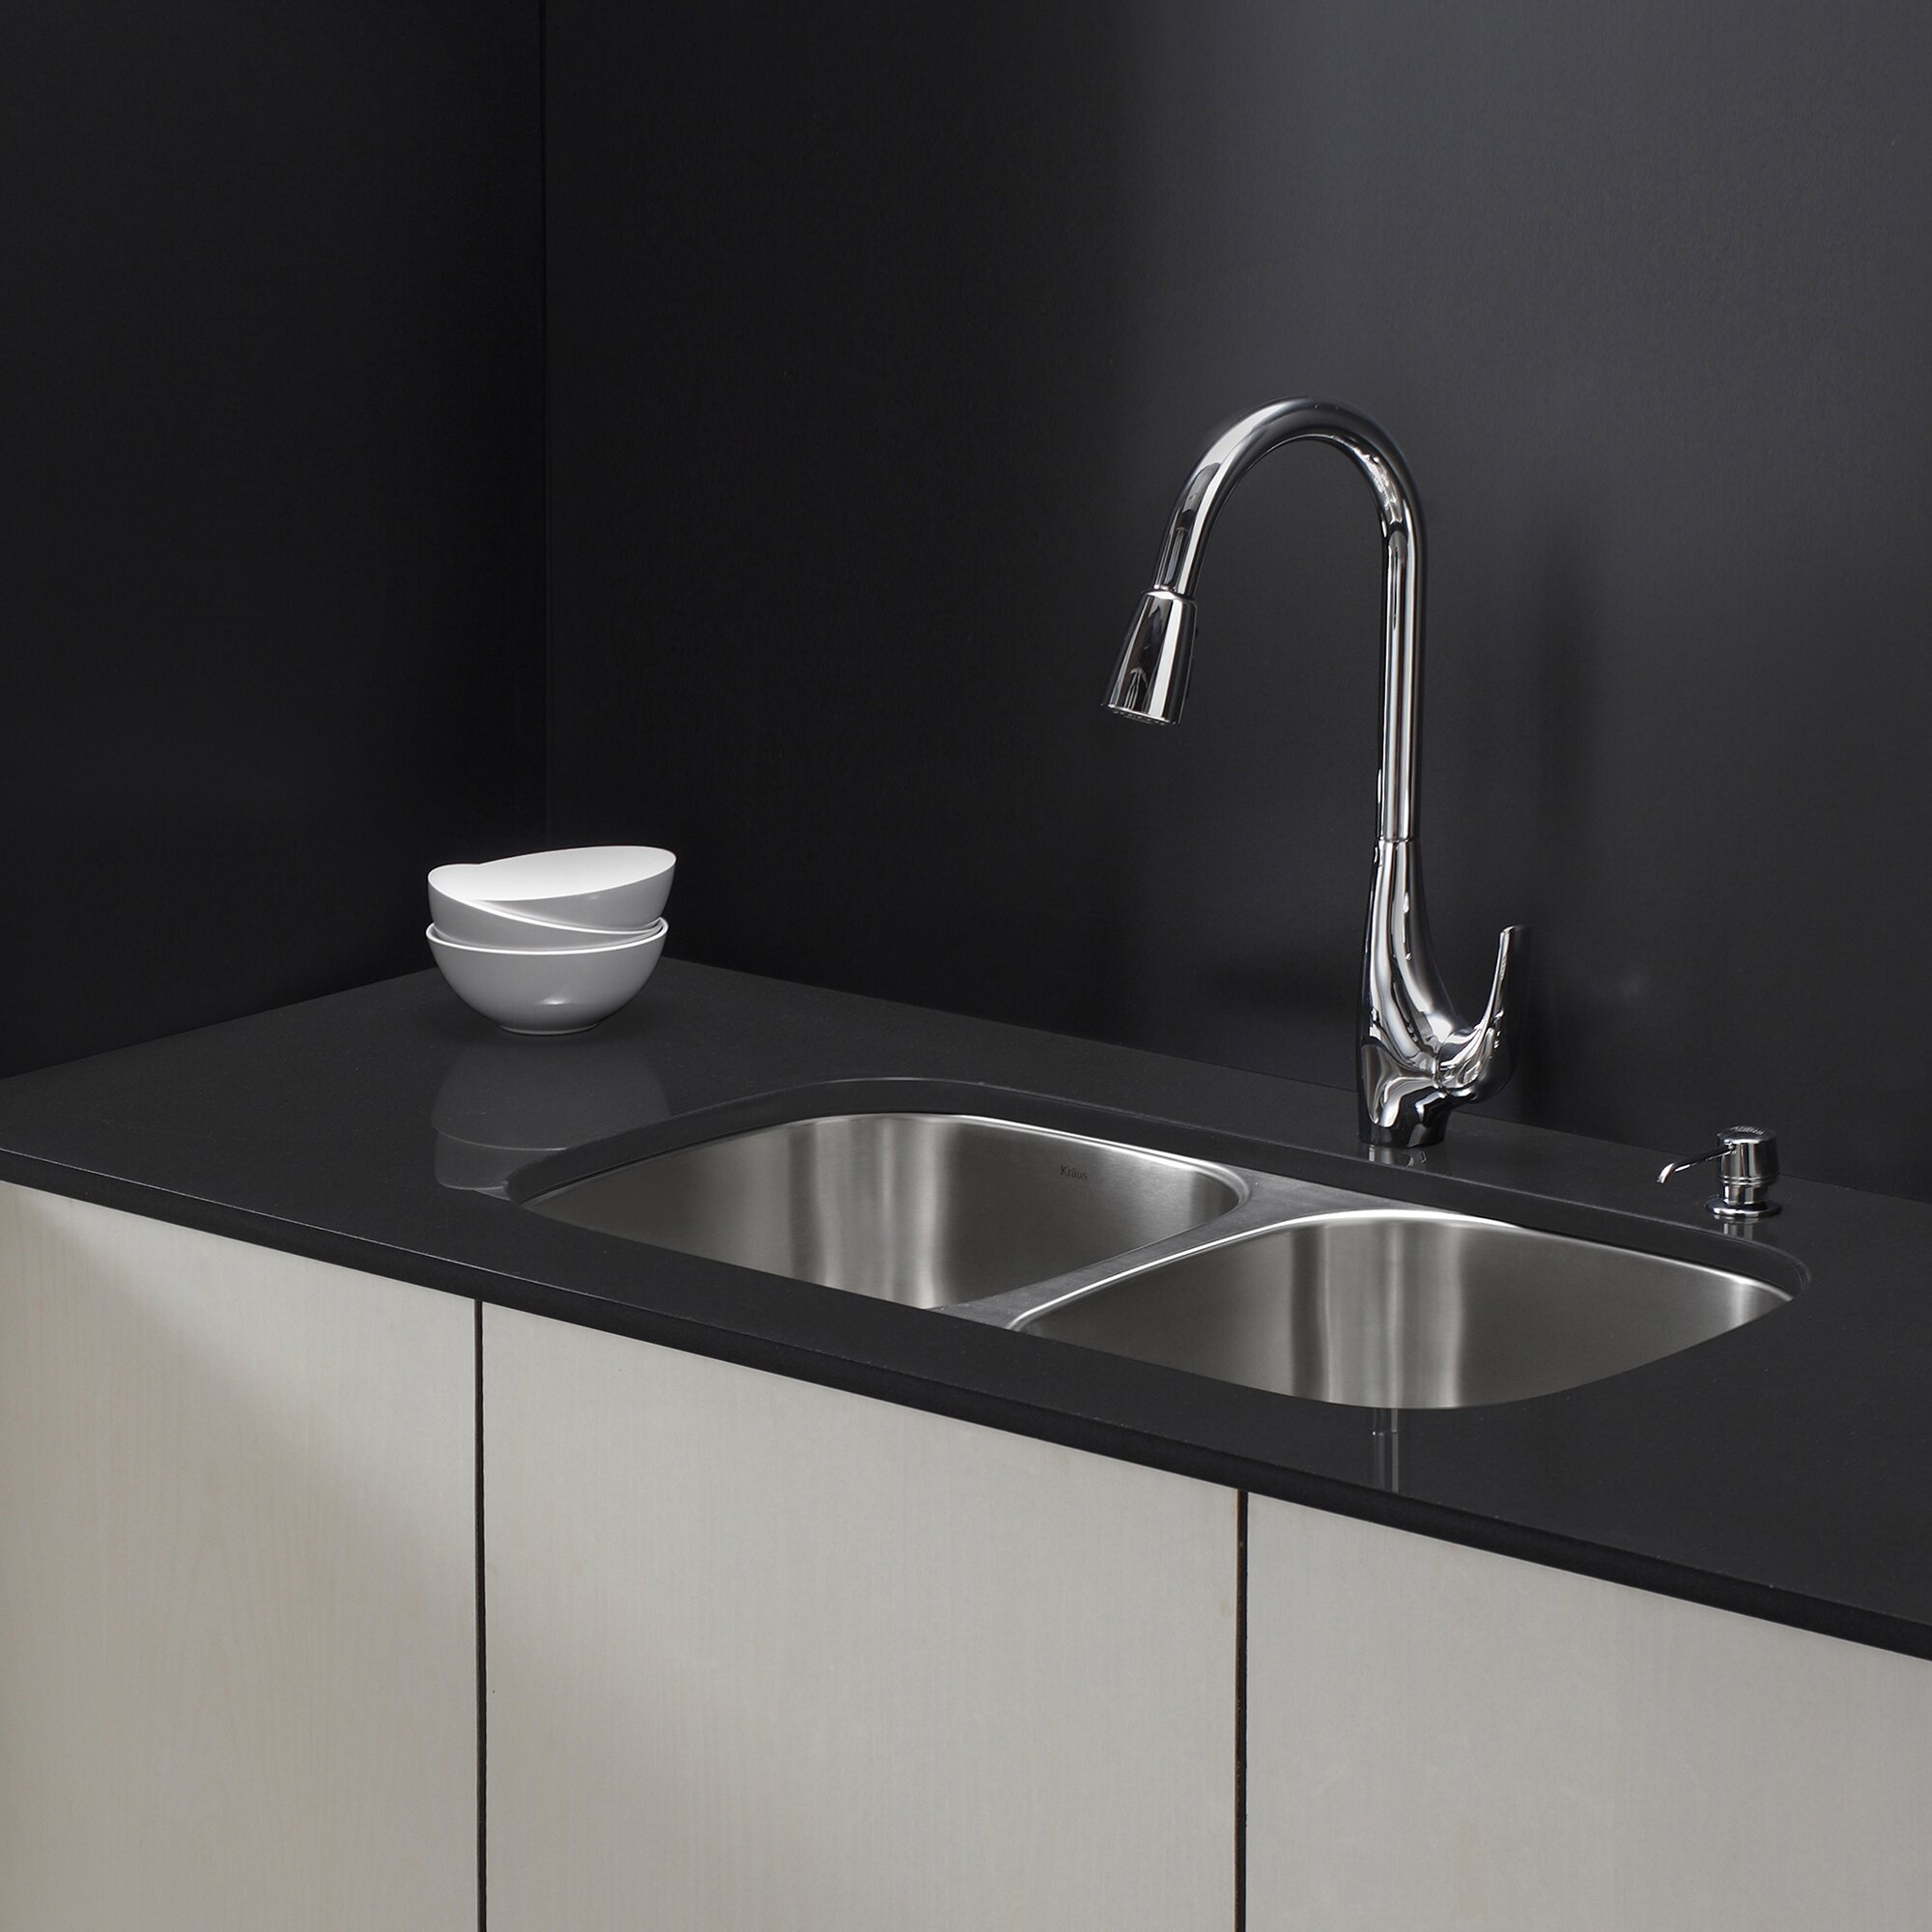 single handle single hole kitchen faucet with lever handle wayfair: melrose single handle kitchen faucet